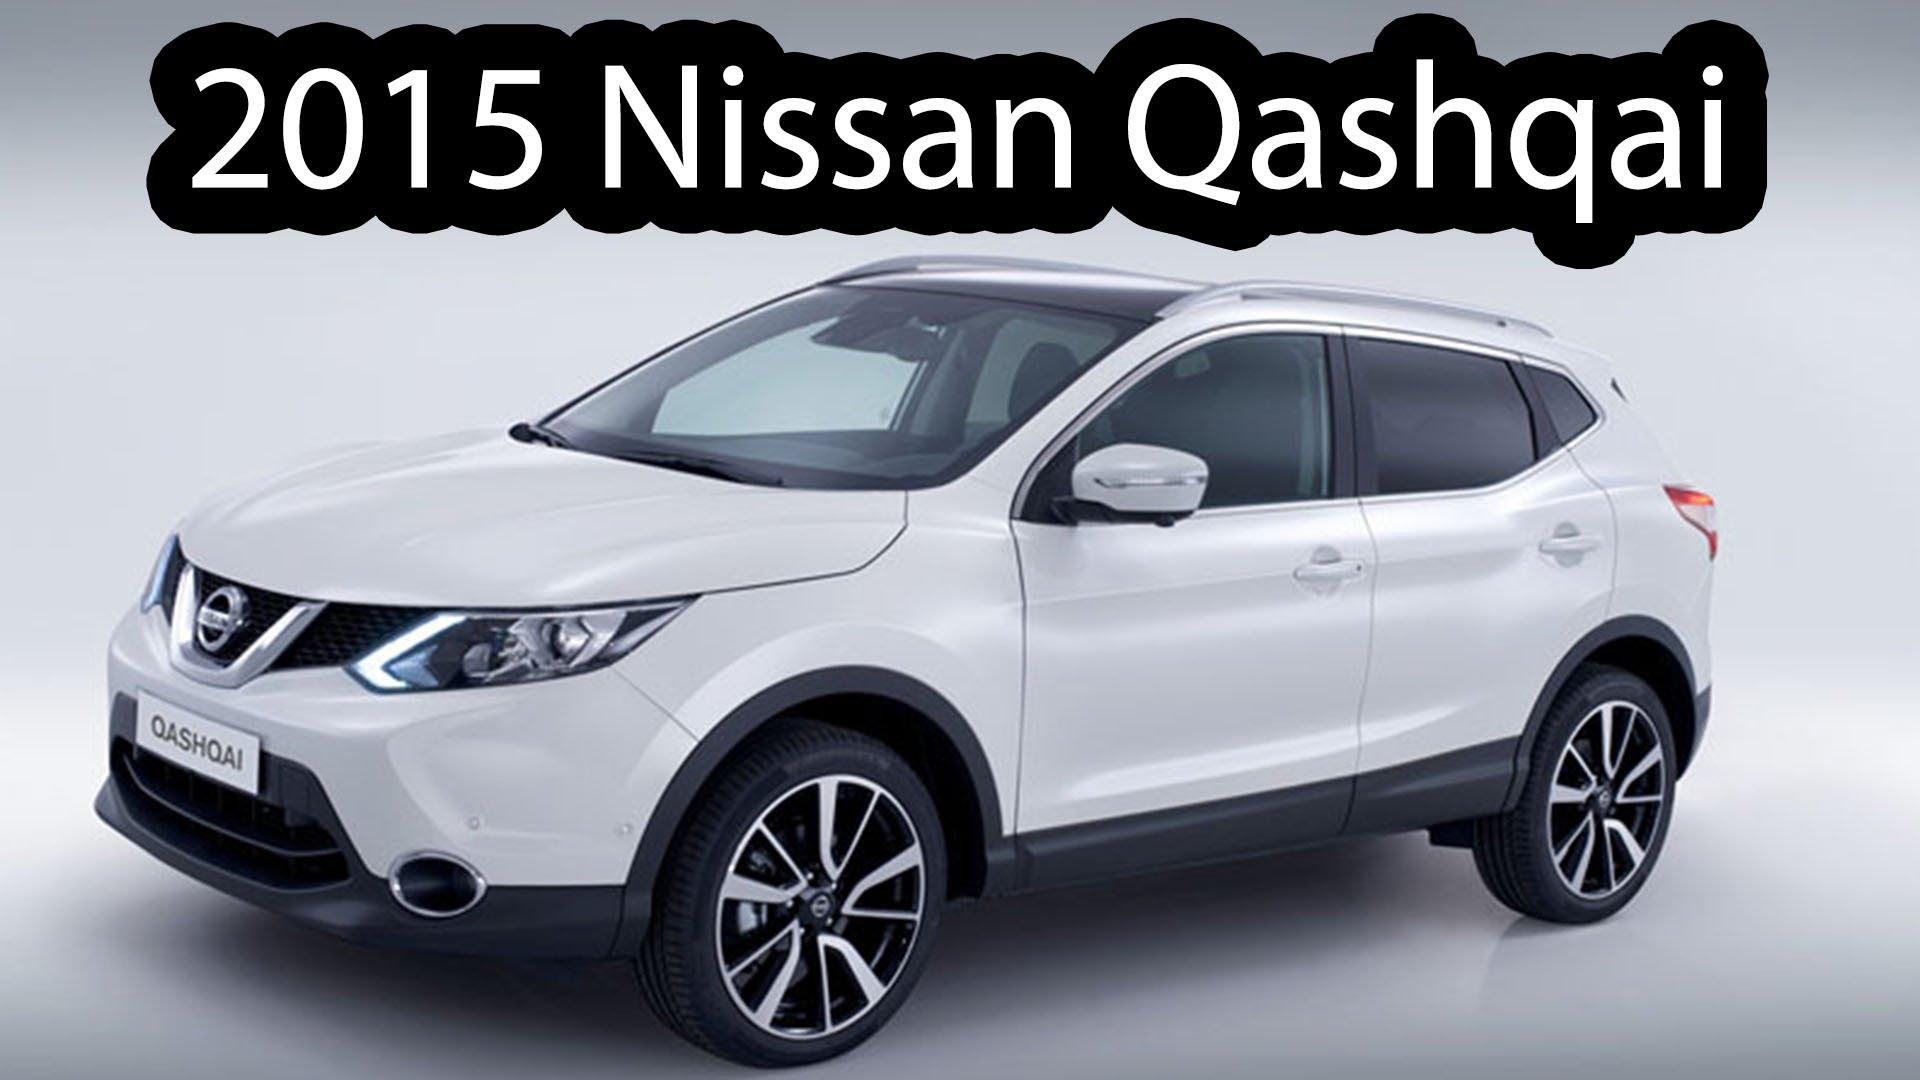 2015 Nissan Qashqai İçin Cazip Fırsat